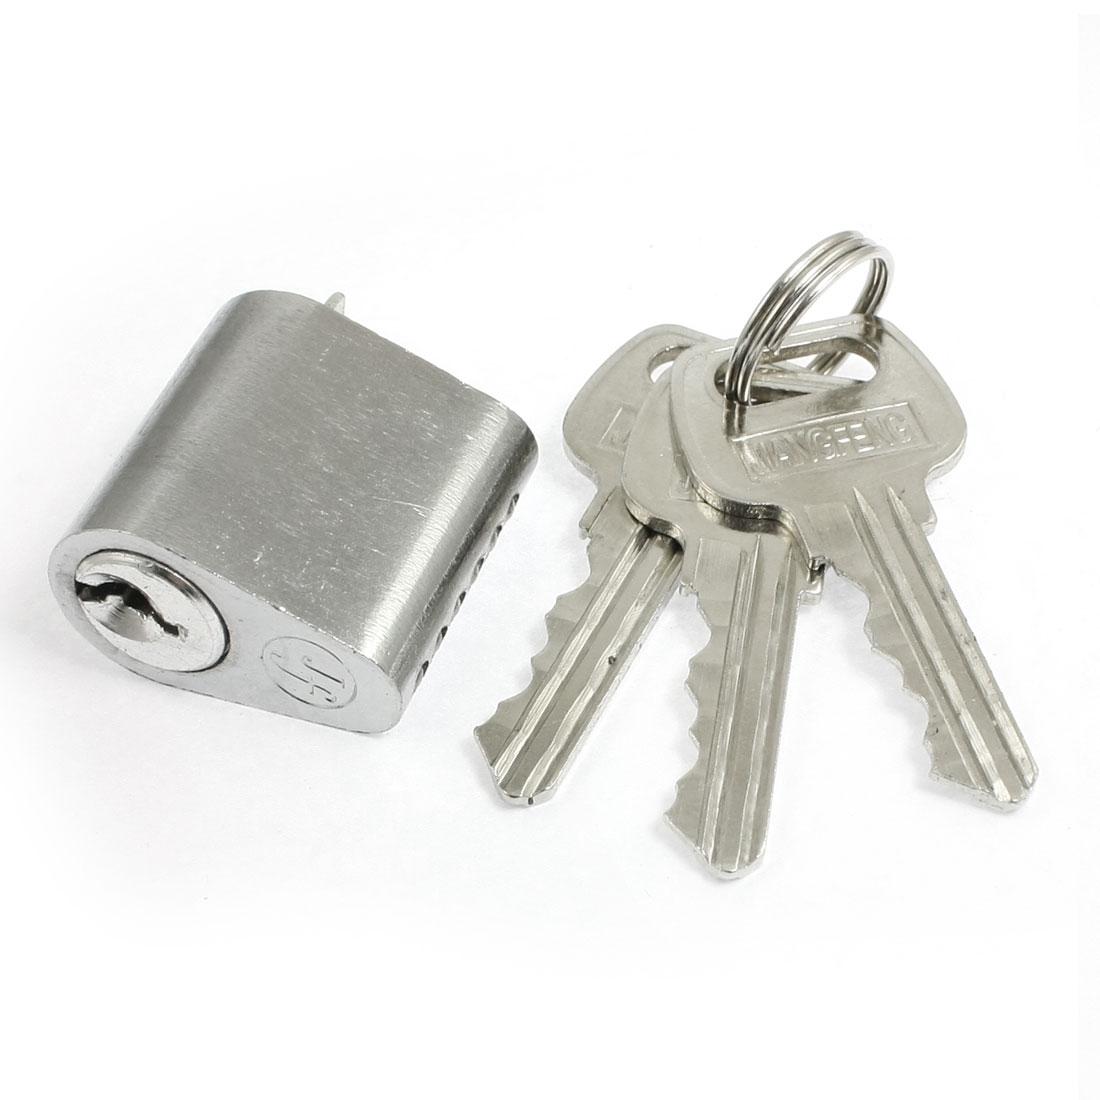 Silver Tone Metal Screw Cross Keyway Security Lock Key Cylinder w 3 Keys